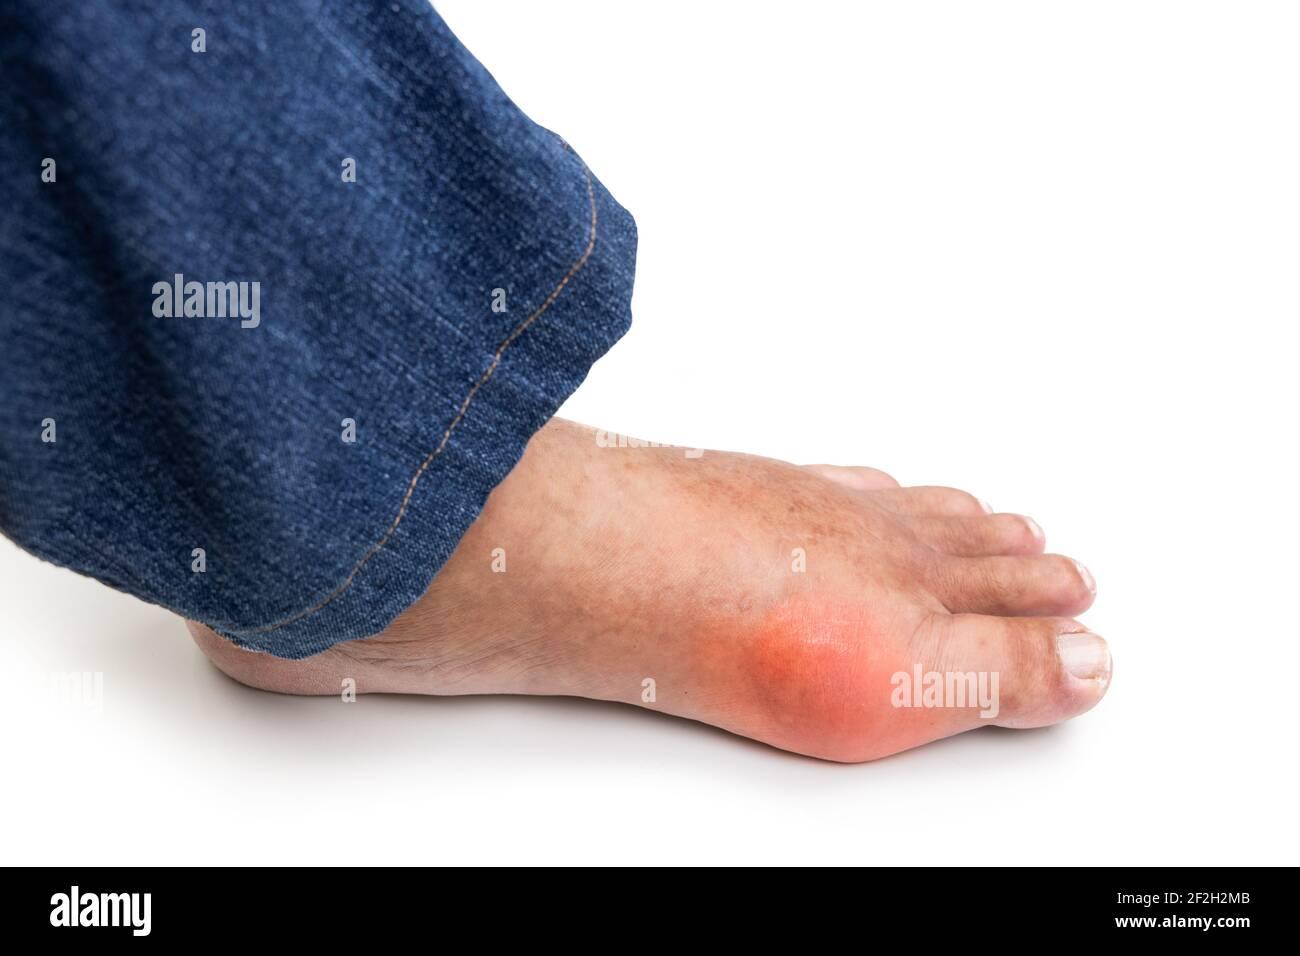 Fuß geschwollen gicht Gicht: Auslöser,